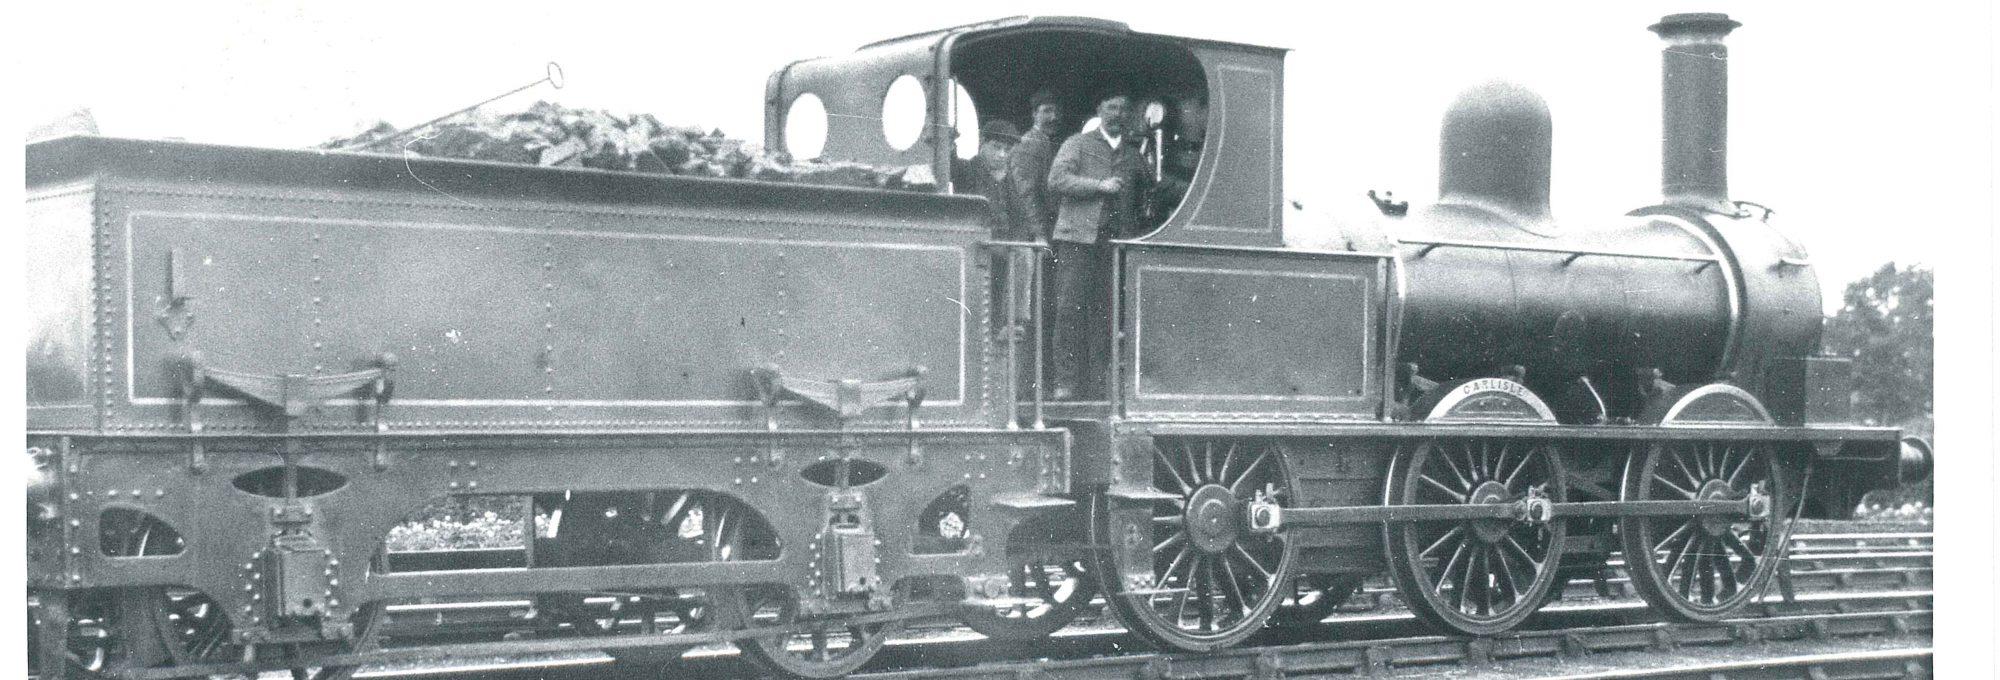 Bishop's Castle Railway Society